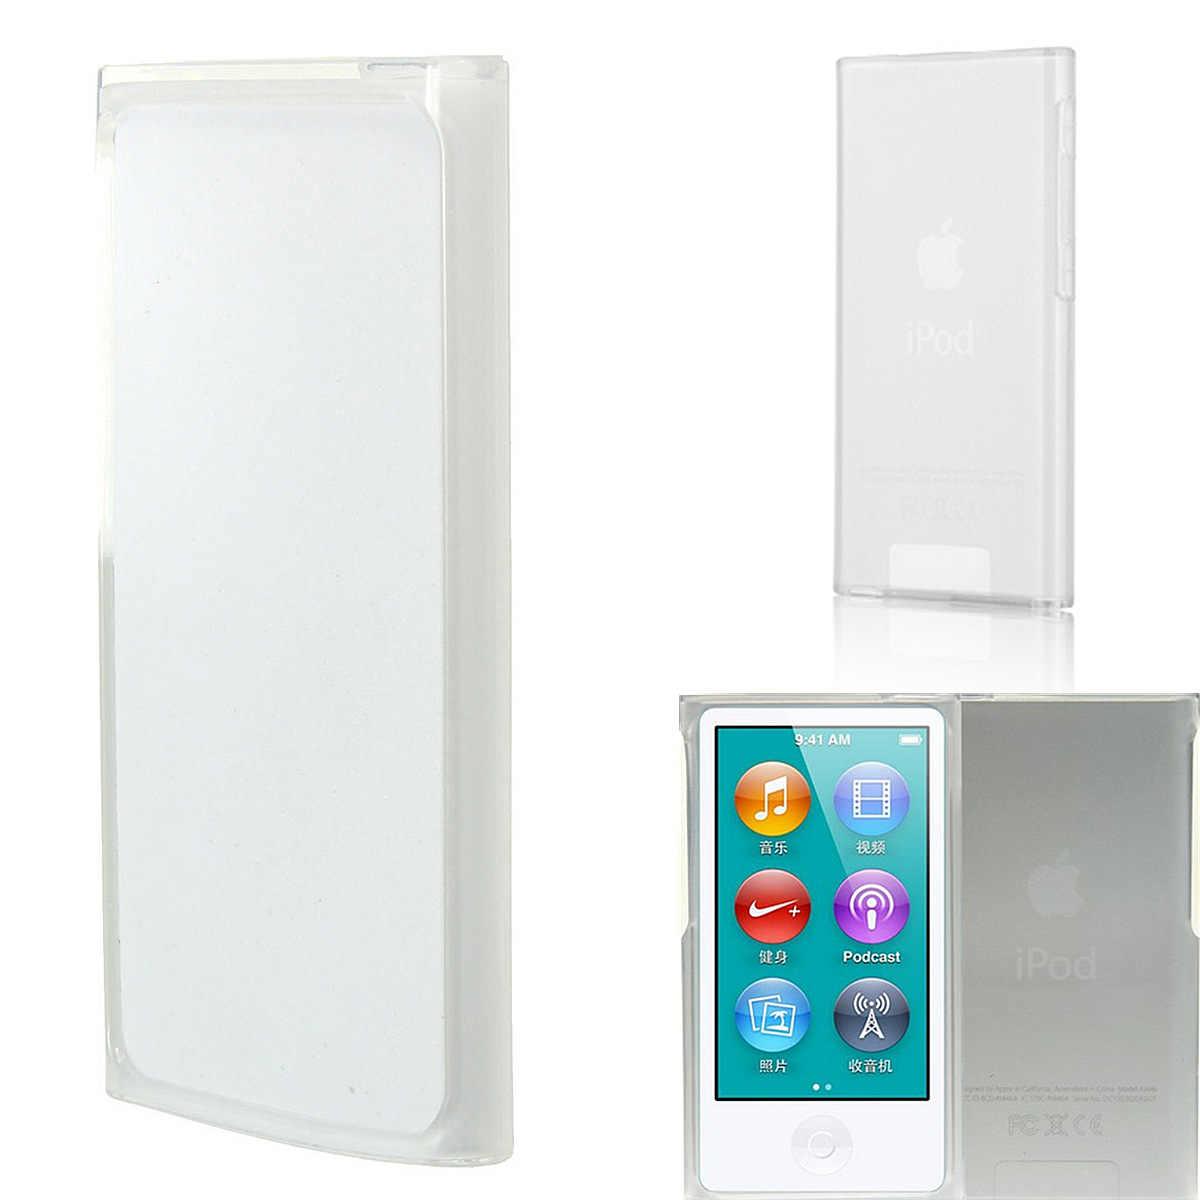 Transparan Bening TPU Gel Case Kulit Penutup untuk Apple IPod-Nano-7th Generasi 7G Melindungi Terhadap Goresan Lecet Tahan Lama